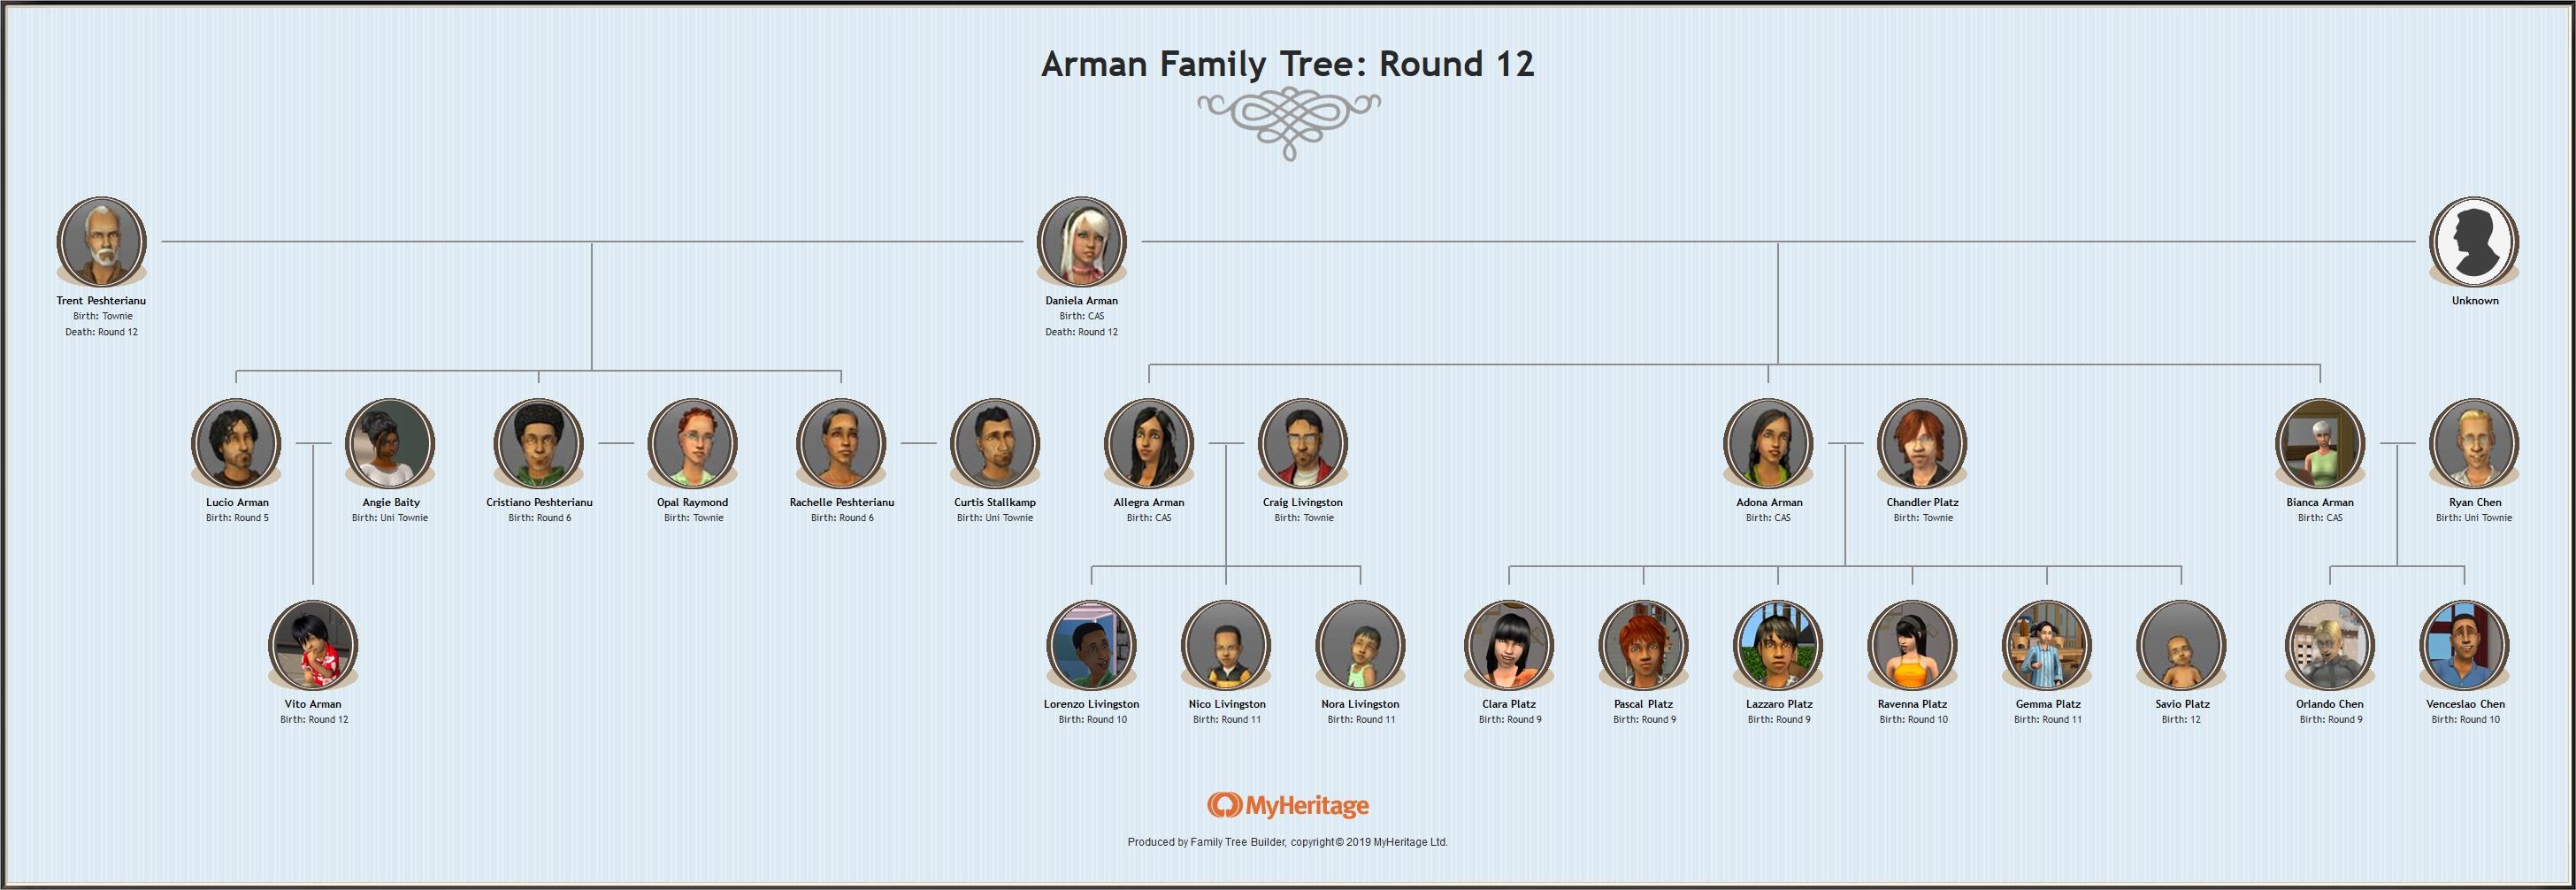 Arman_Peshterianu Family_ Round 12.JPG